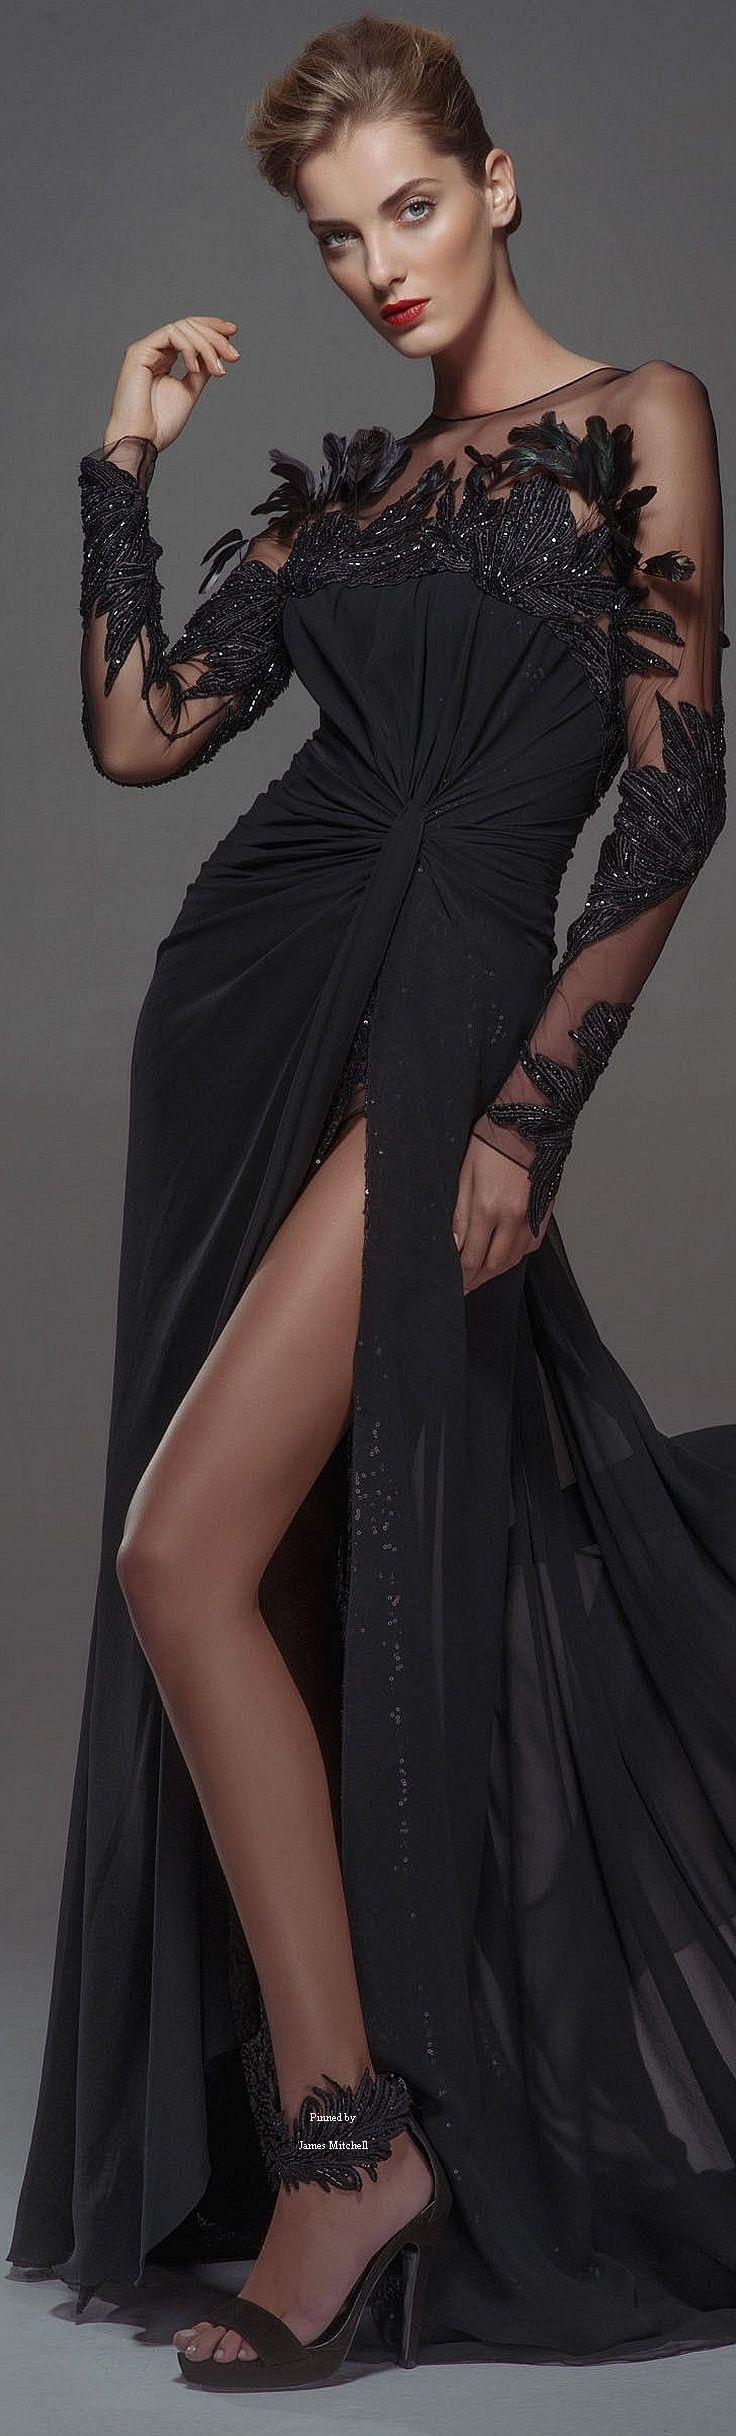 Blanka matragi couture fallwinter fashion for concept